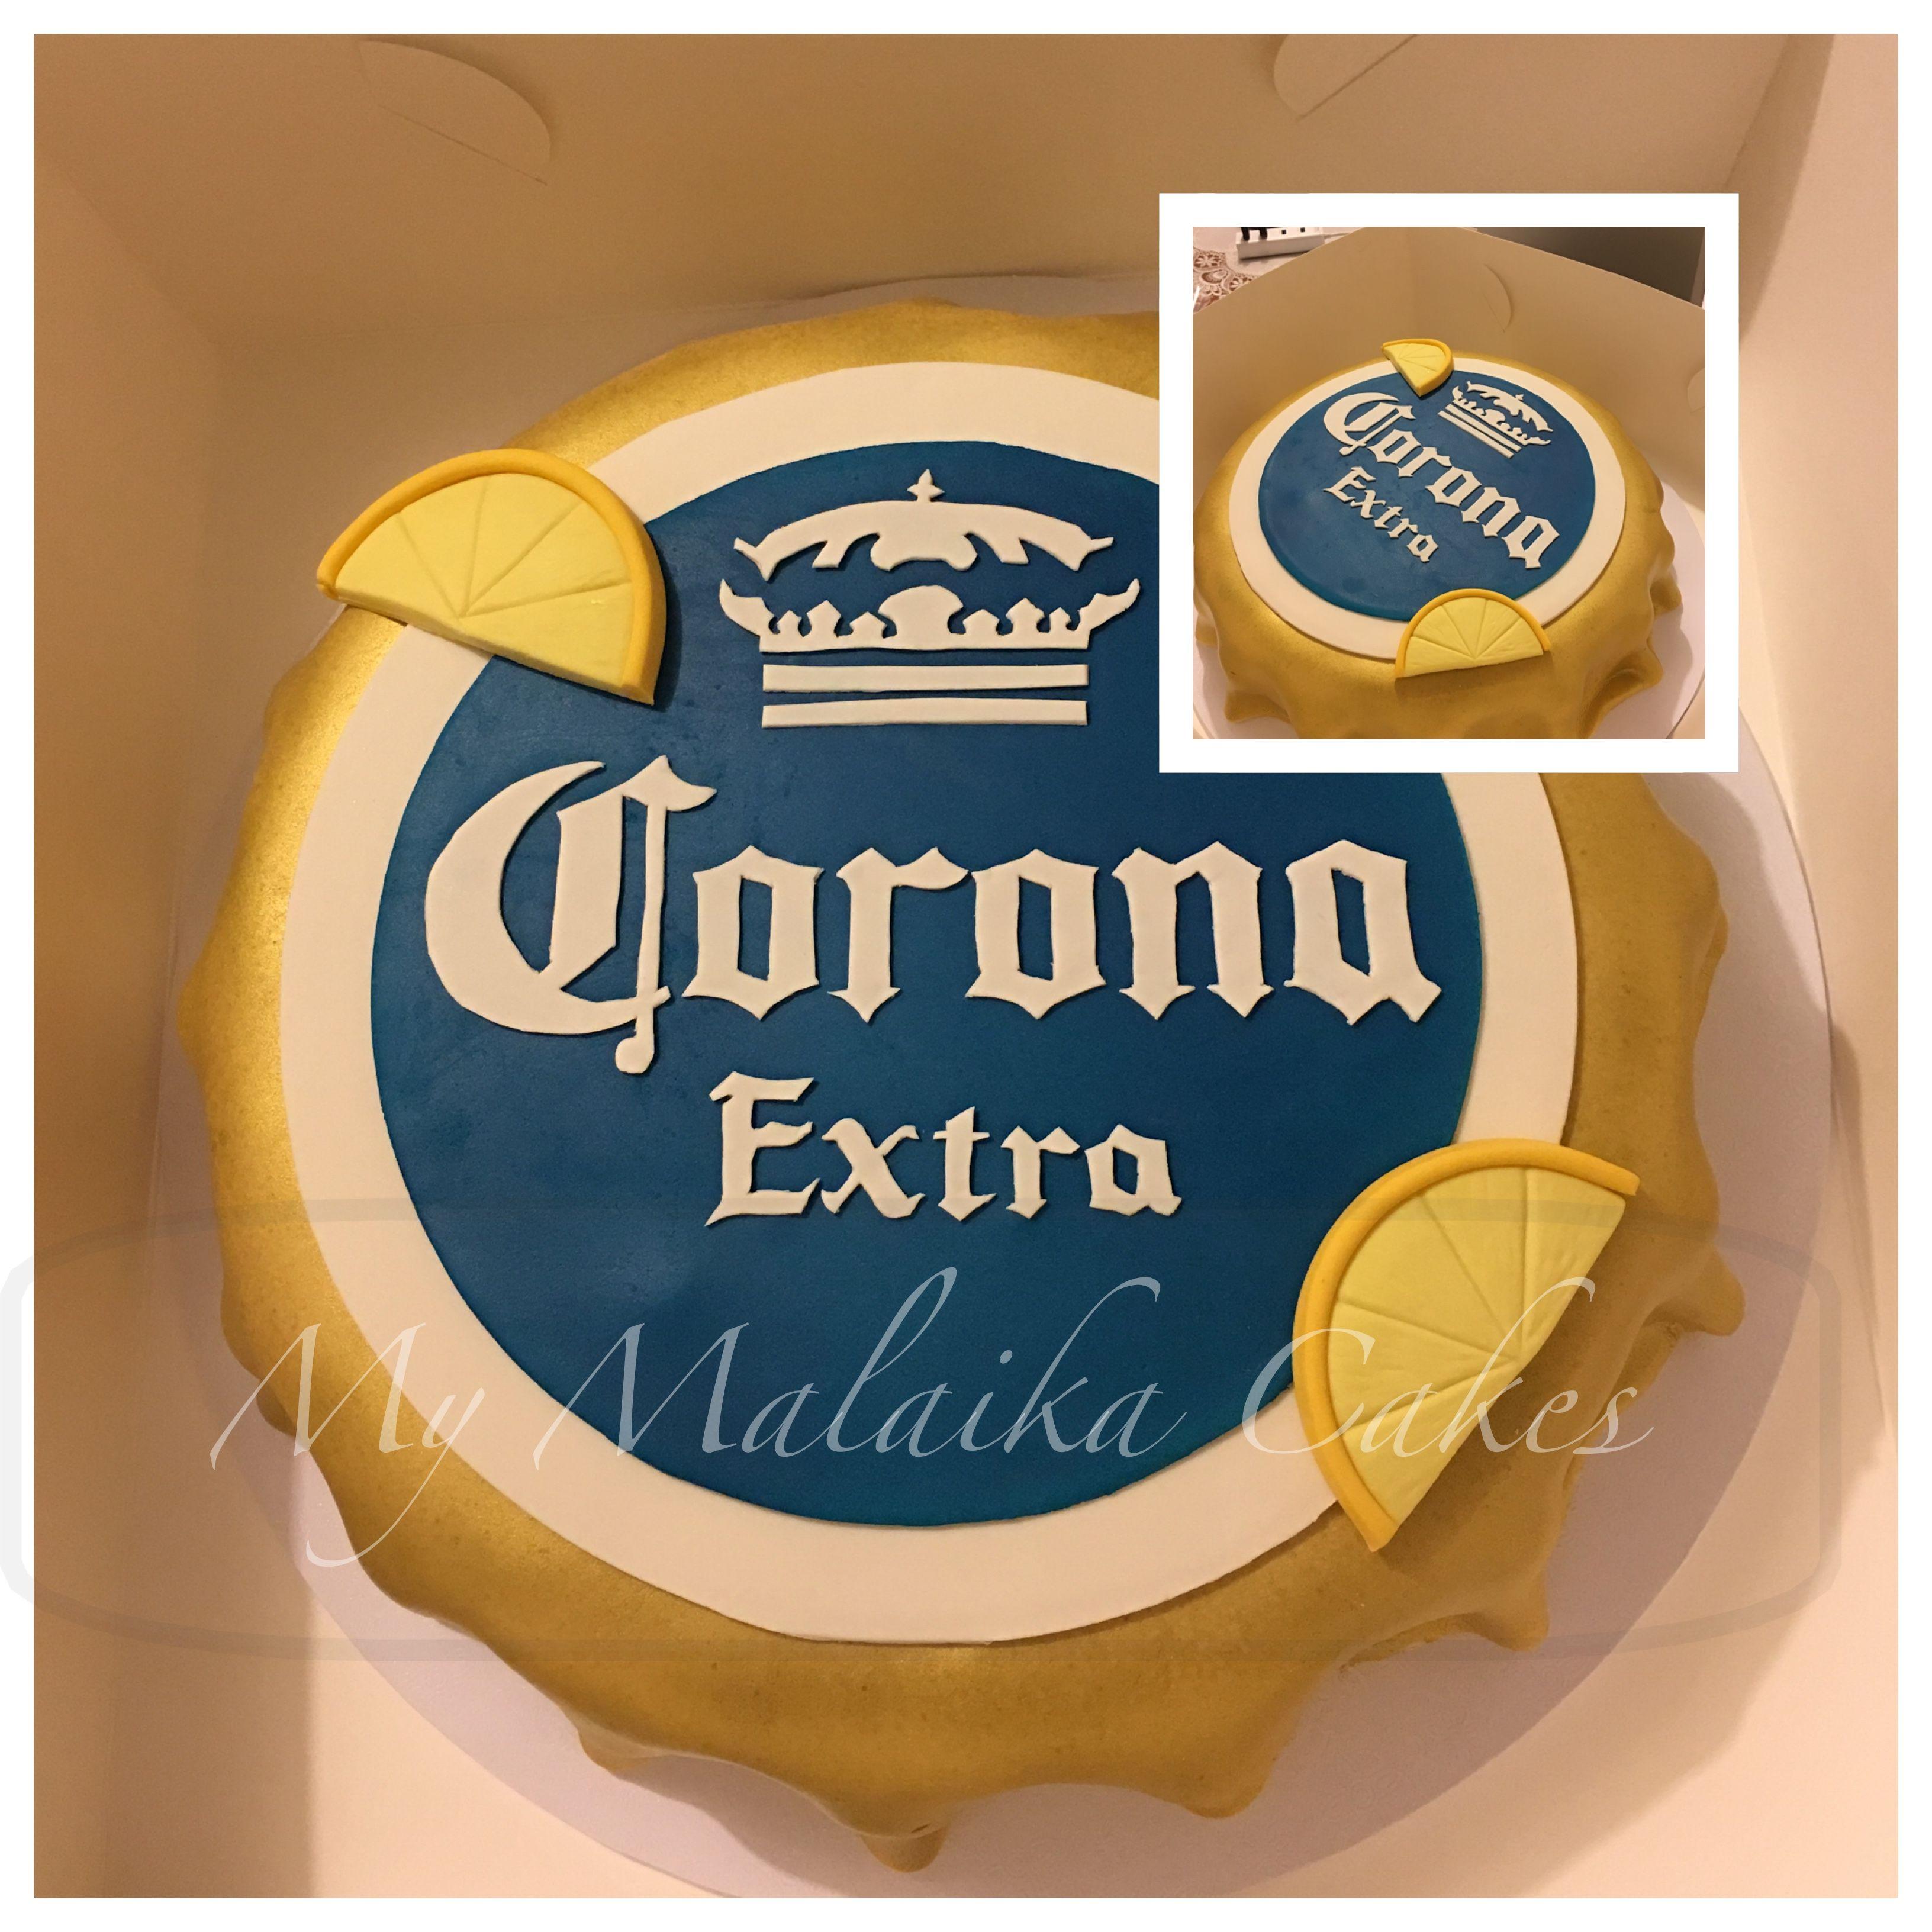 Corona bottle top cake cakes i make fb my malaika cakes